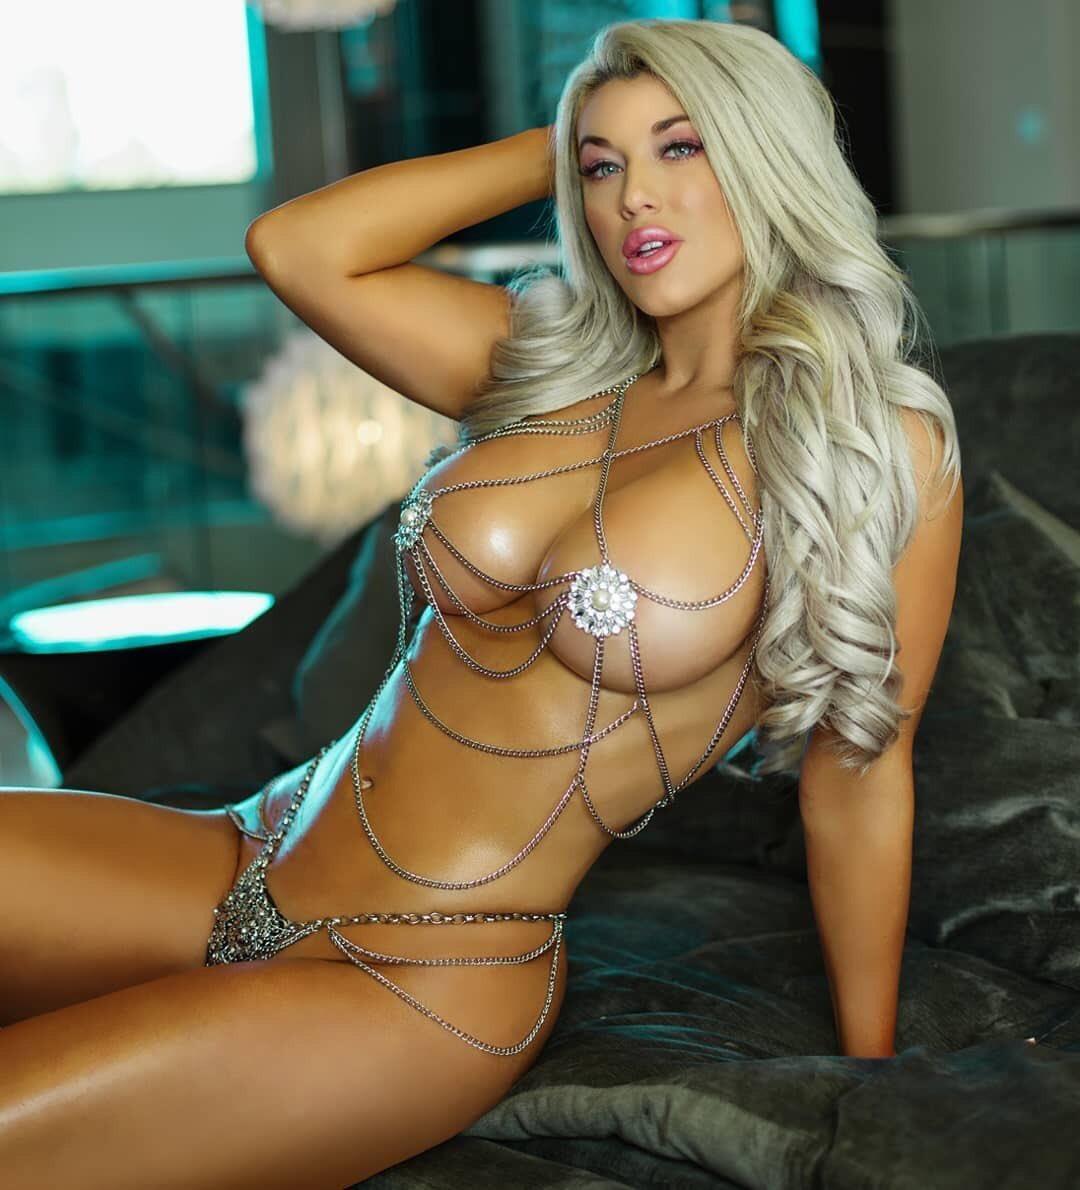 Giselle murray naked seductive brunette babe pandesia world